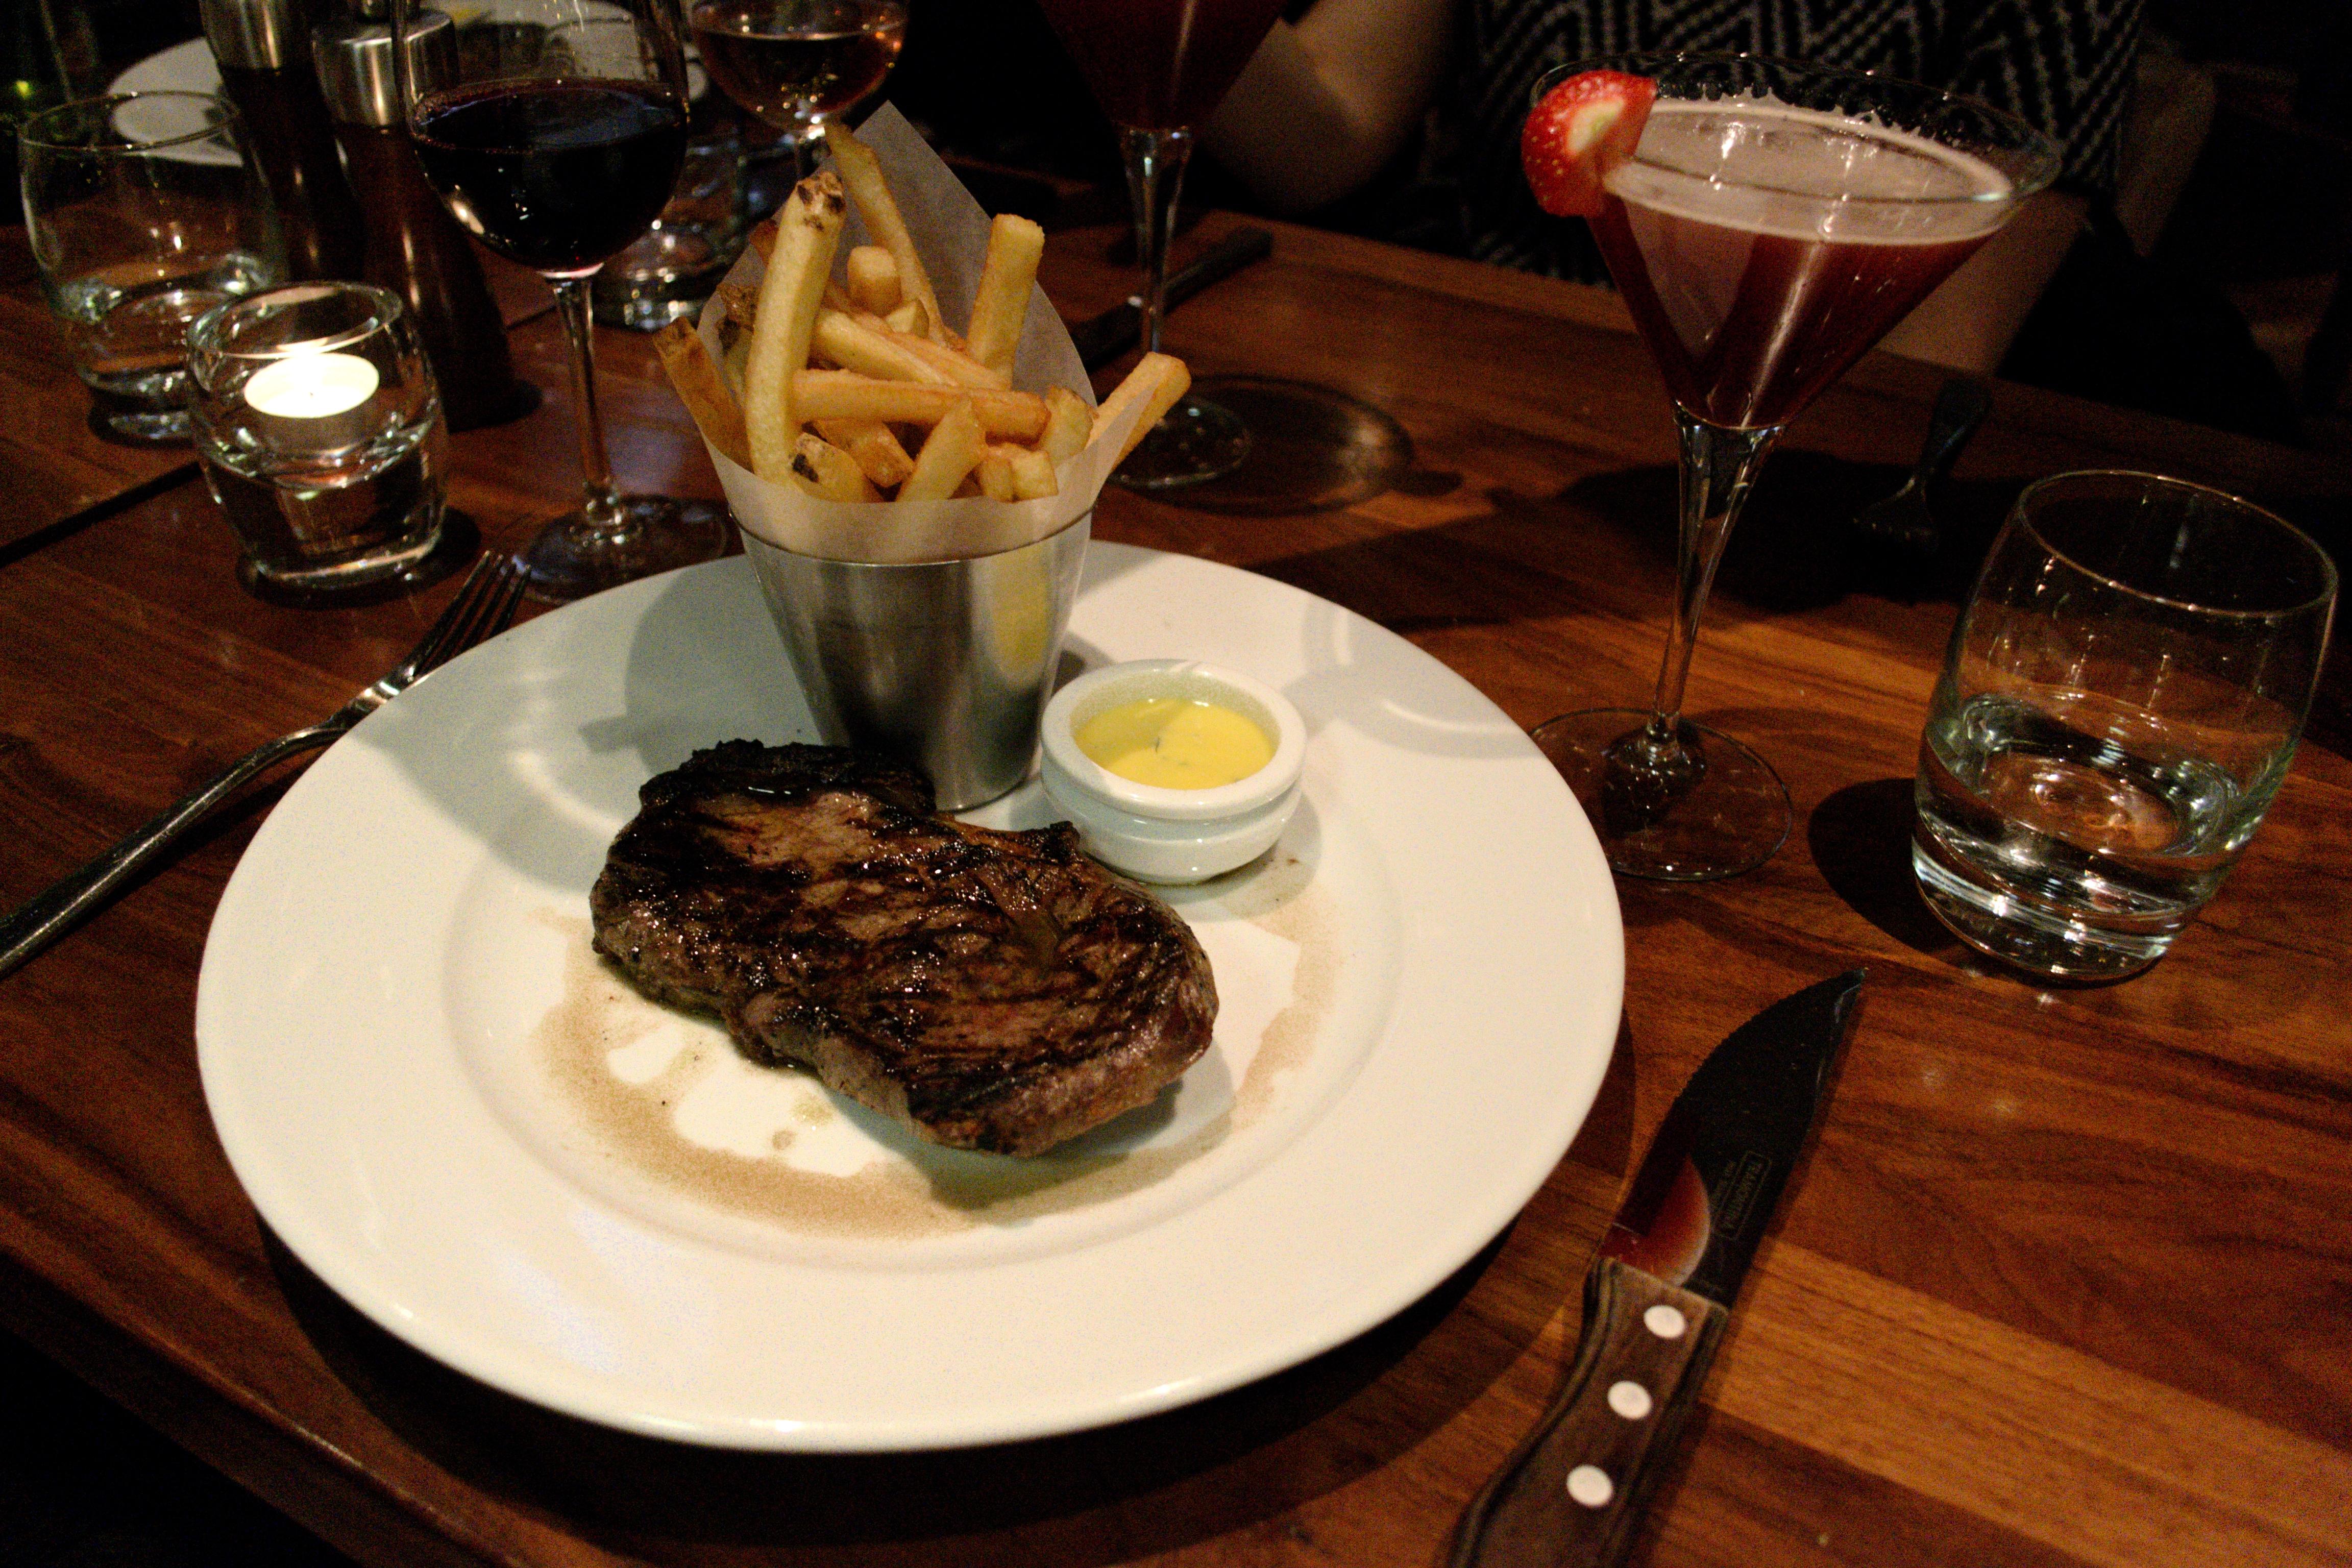 steak dinner in glasgow